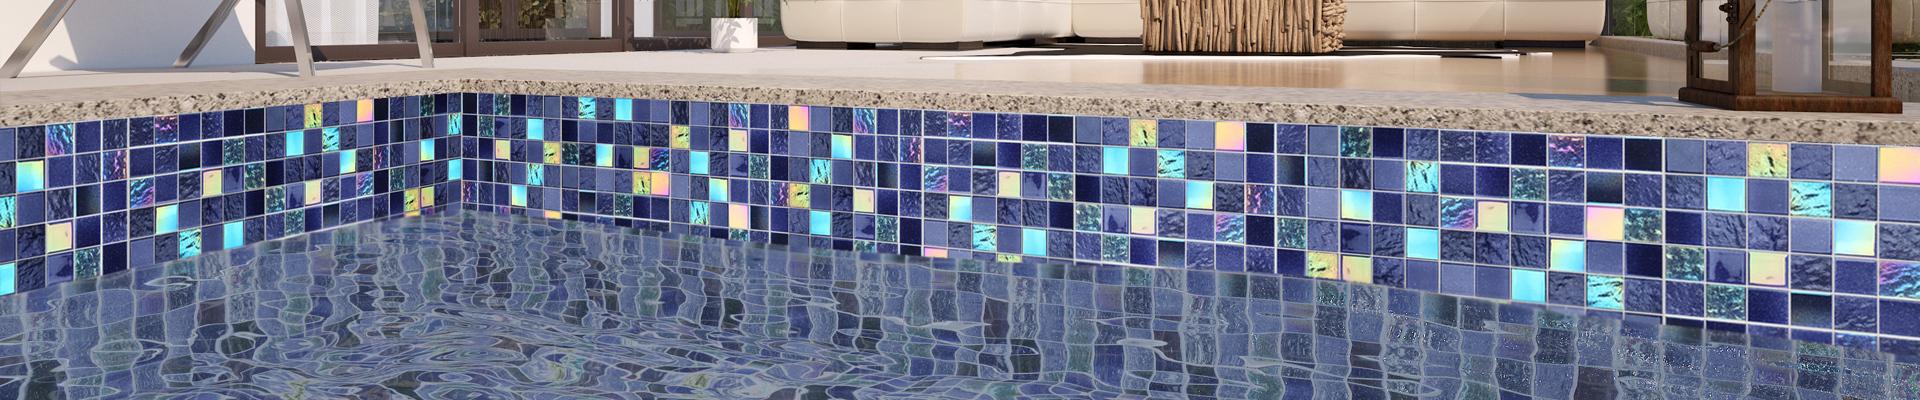 video-swimming pool tiles painted for swimming pool Heng Xing-Heng Xing-img